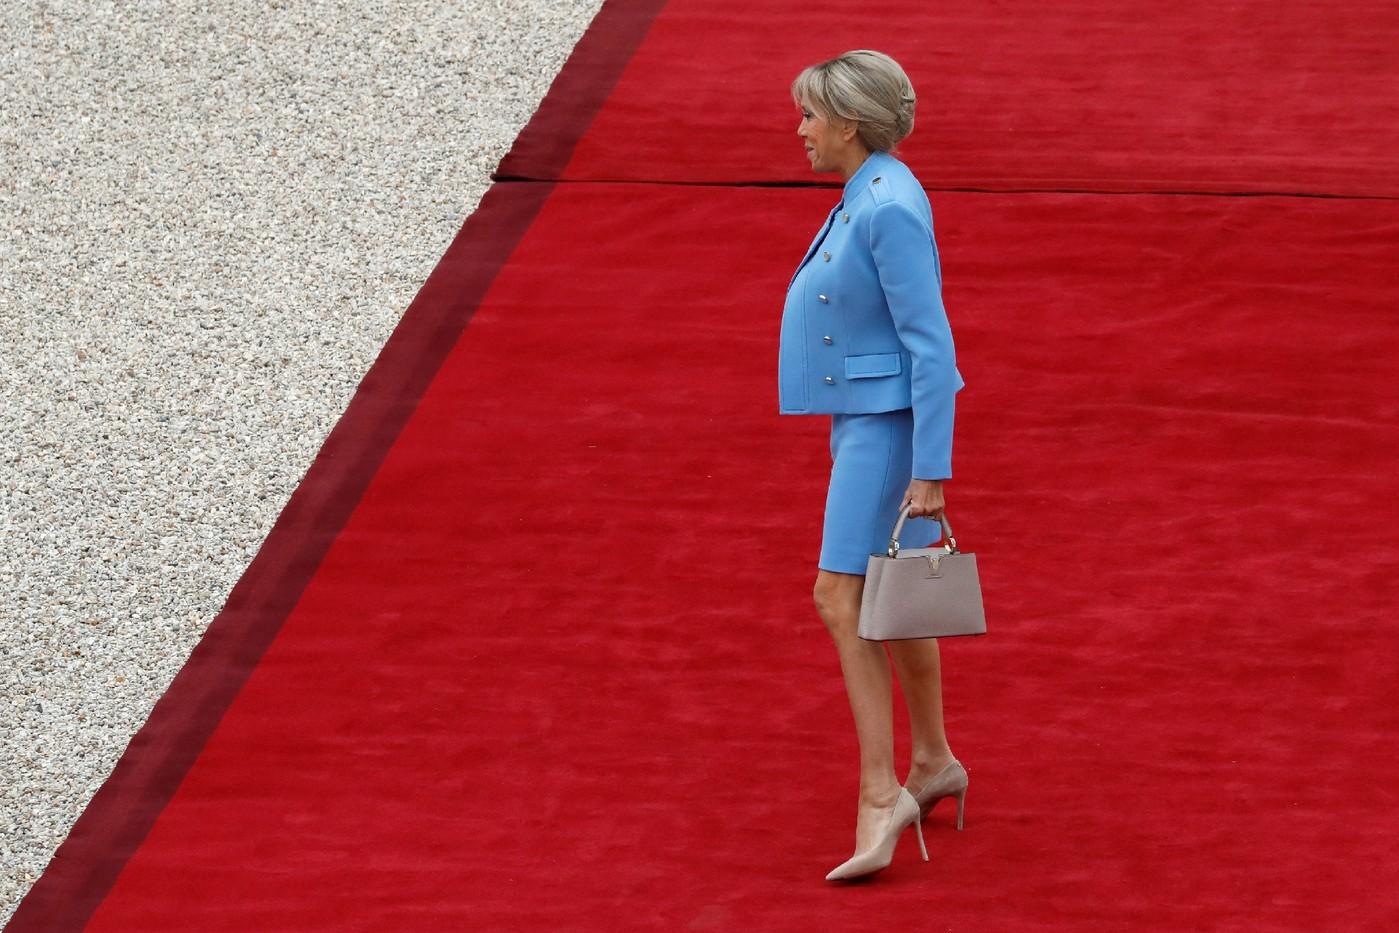 Brigitte Macron; i suoi segreti per rimanere in forma